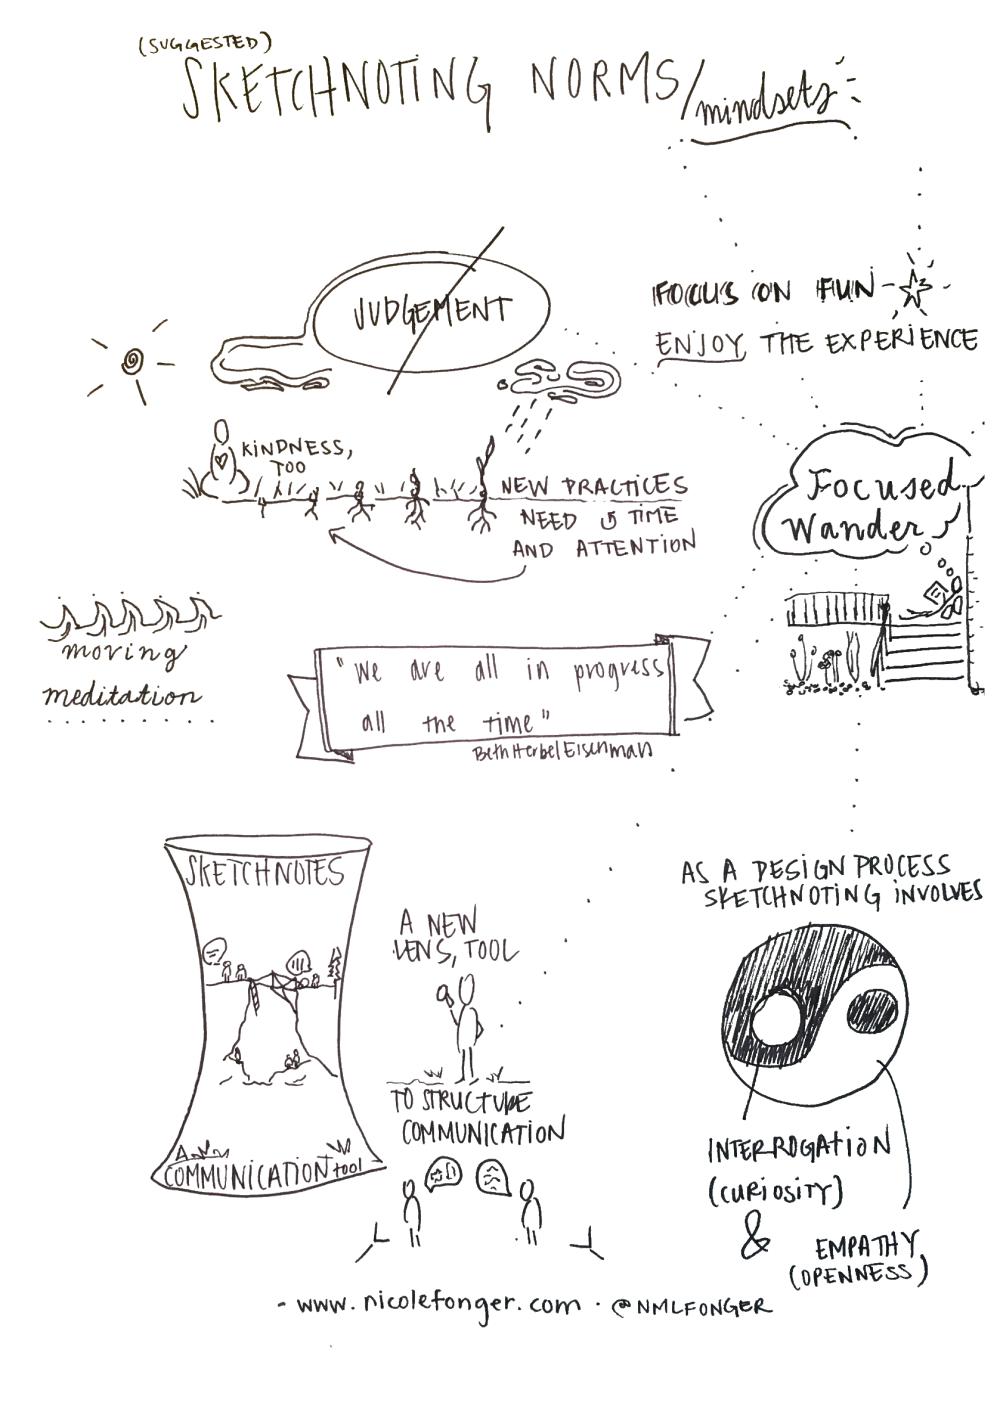 Sketchnoting norms and mindsets